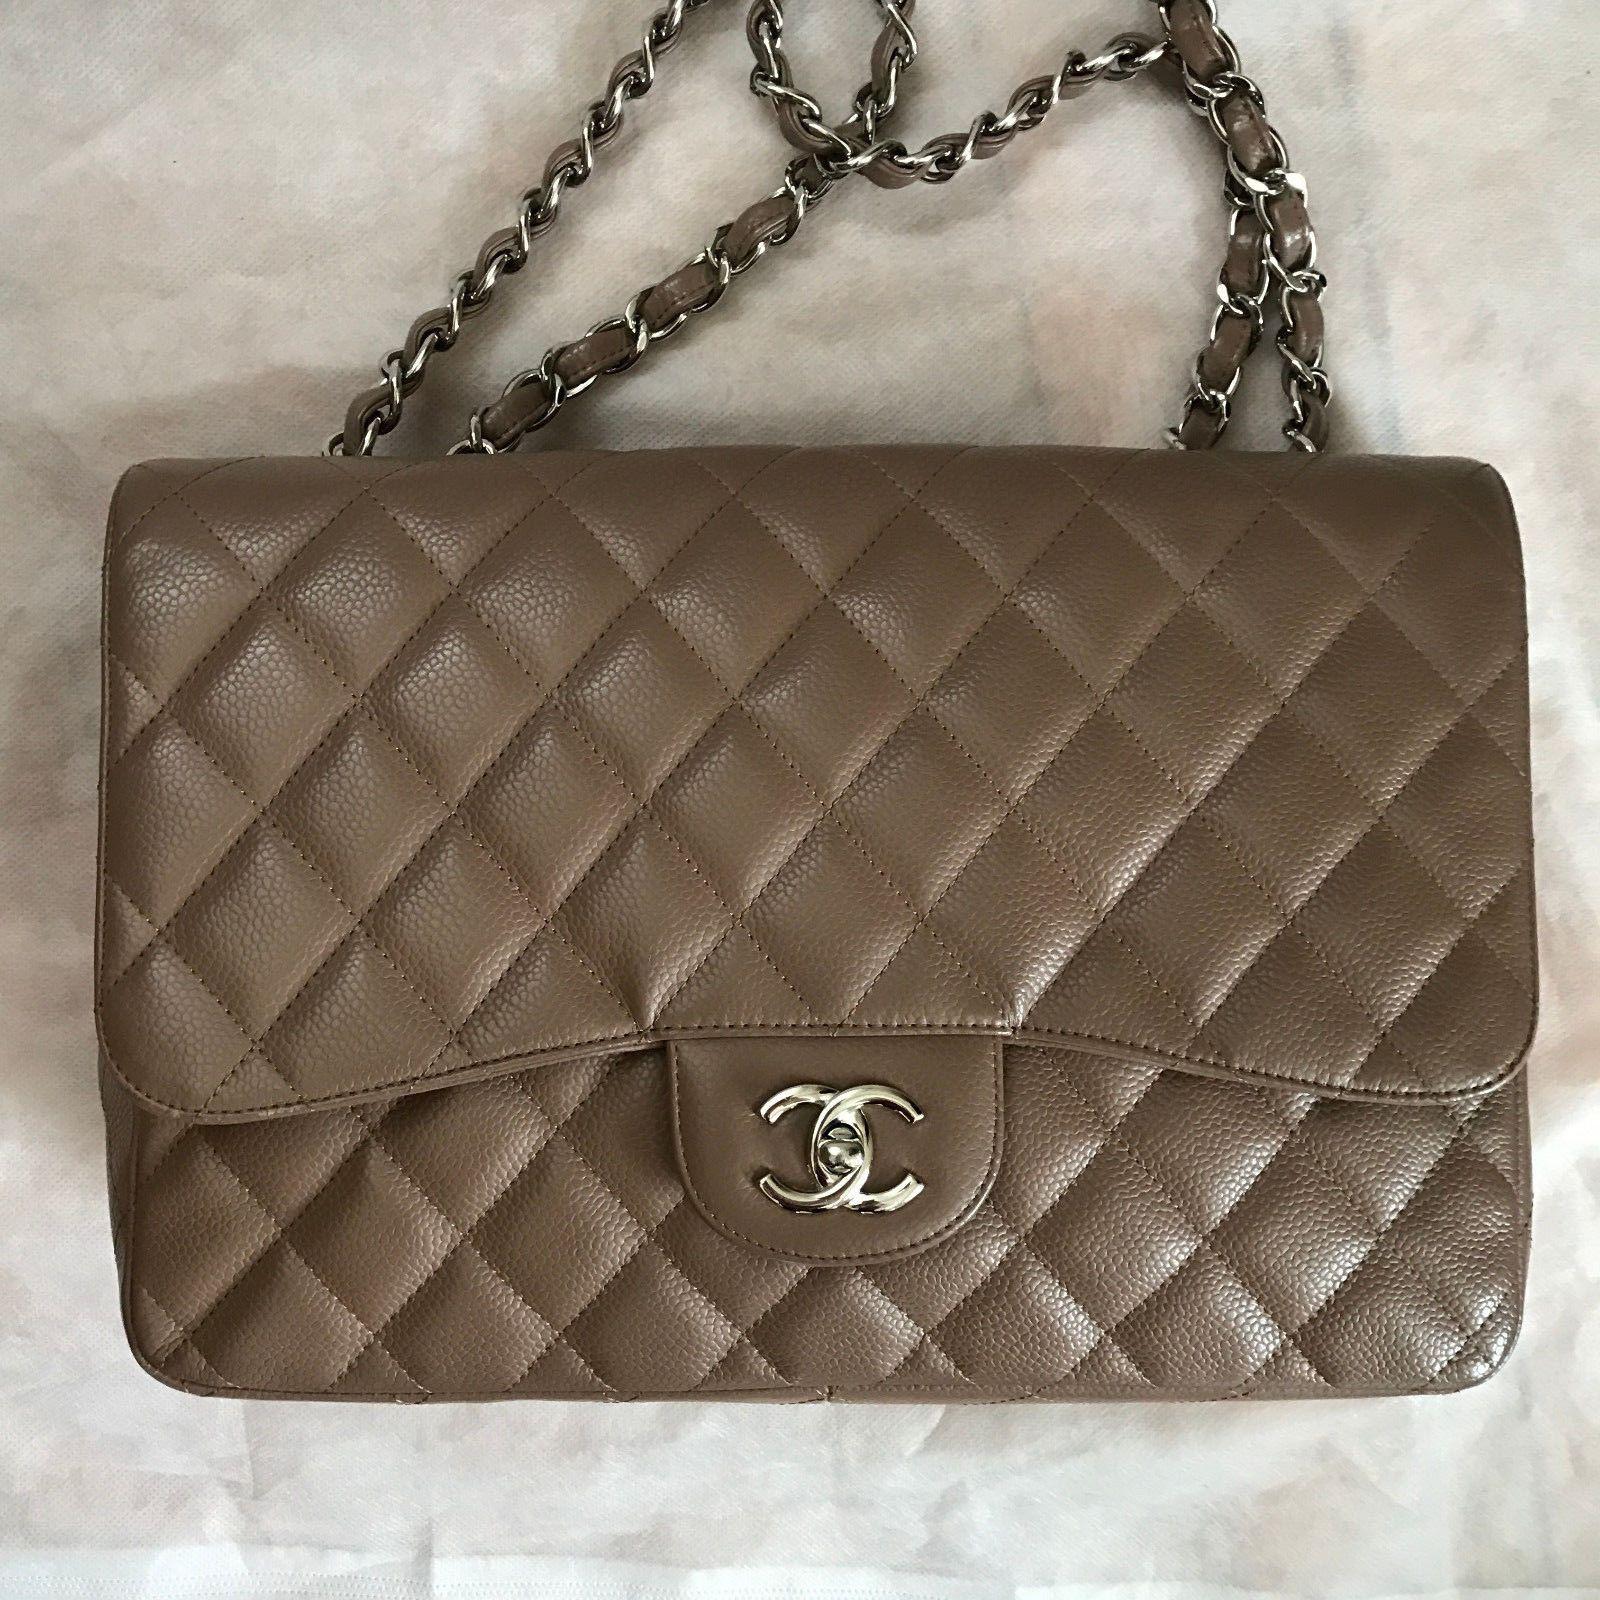 b8f38acdea34 Authentic Chanel Brown Caviar Jumbo Classic 2.55 Single Flap Bag $2959.0